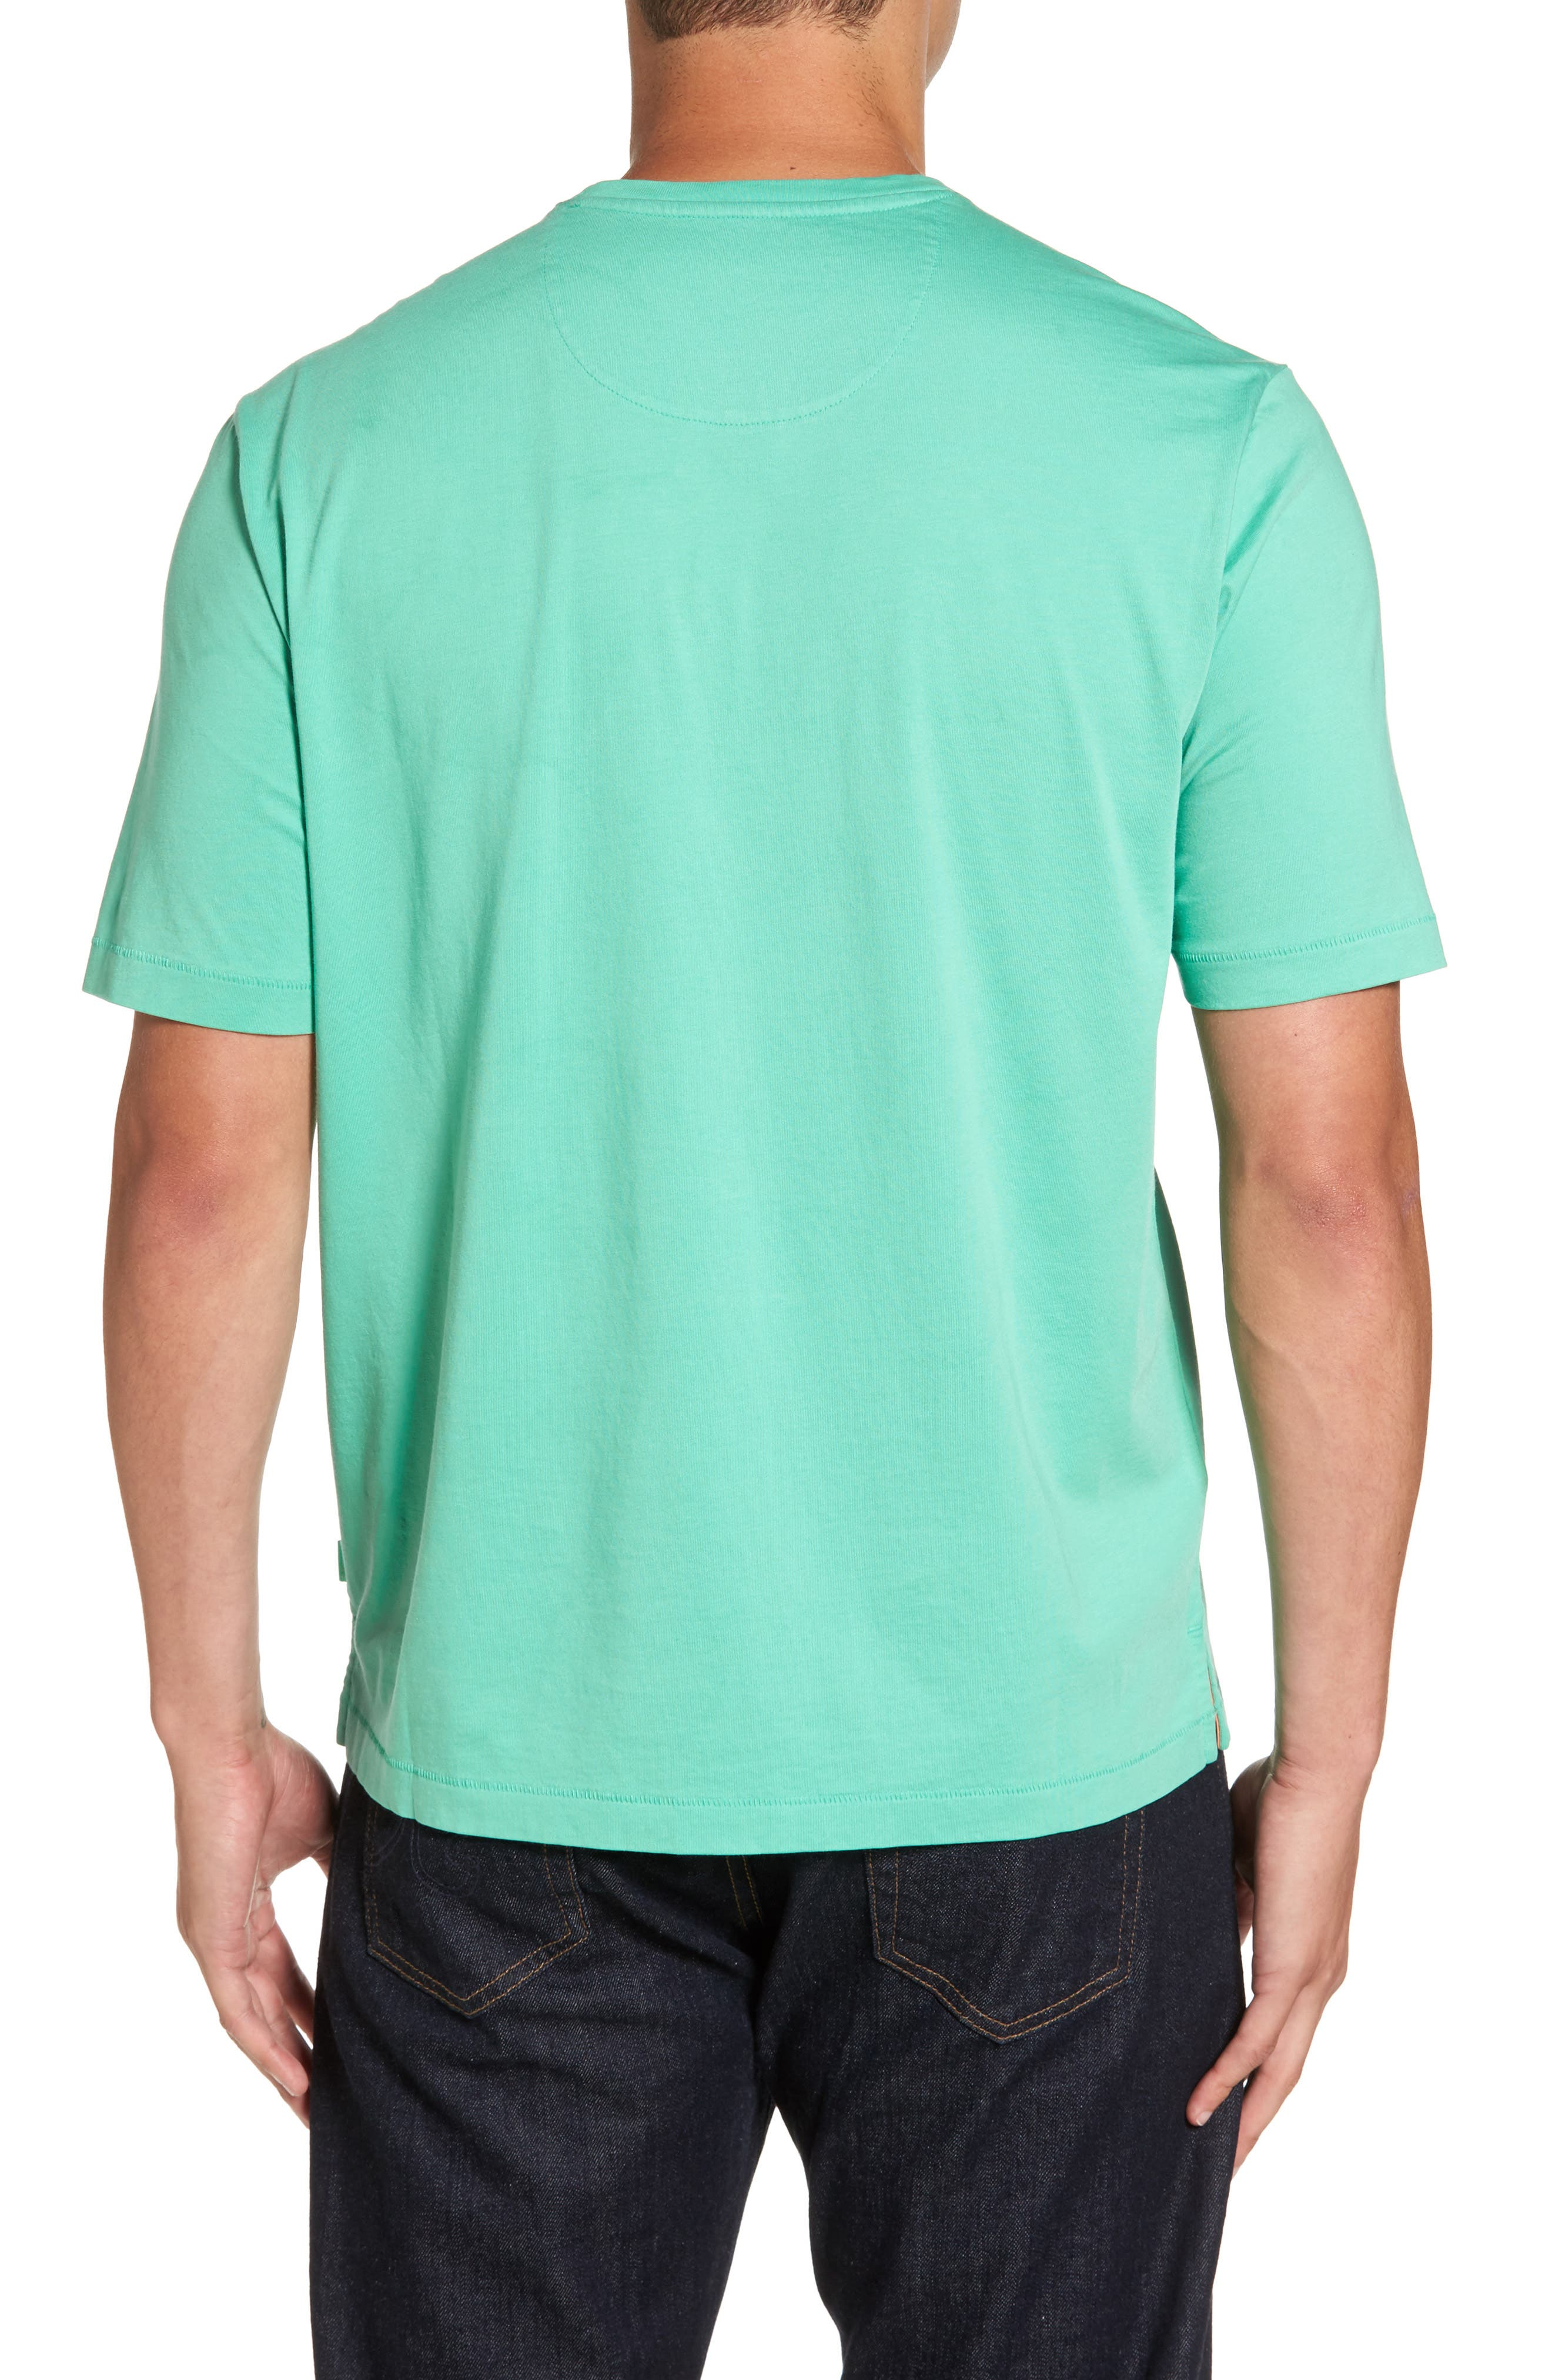 Bali Skyline Pocket T-Shirt,                             Alternate thumbnail 2, color,                             300